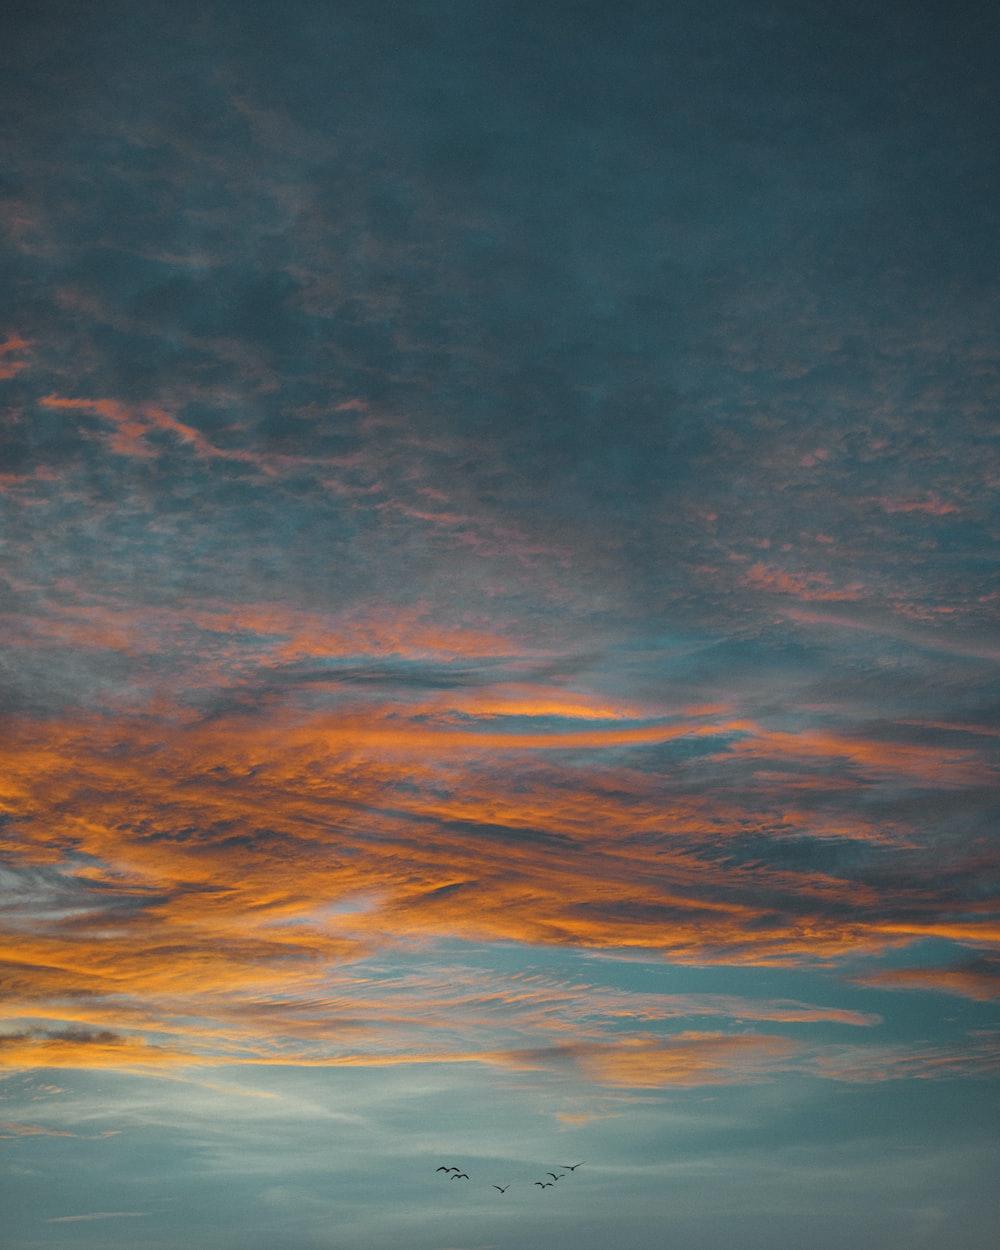 flock of birds in flight under clouds during golden hour